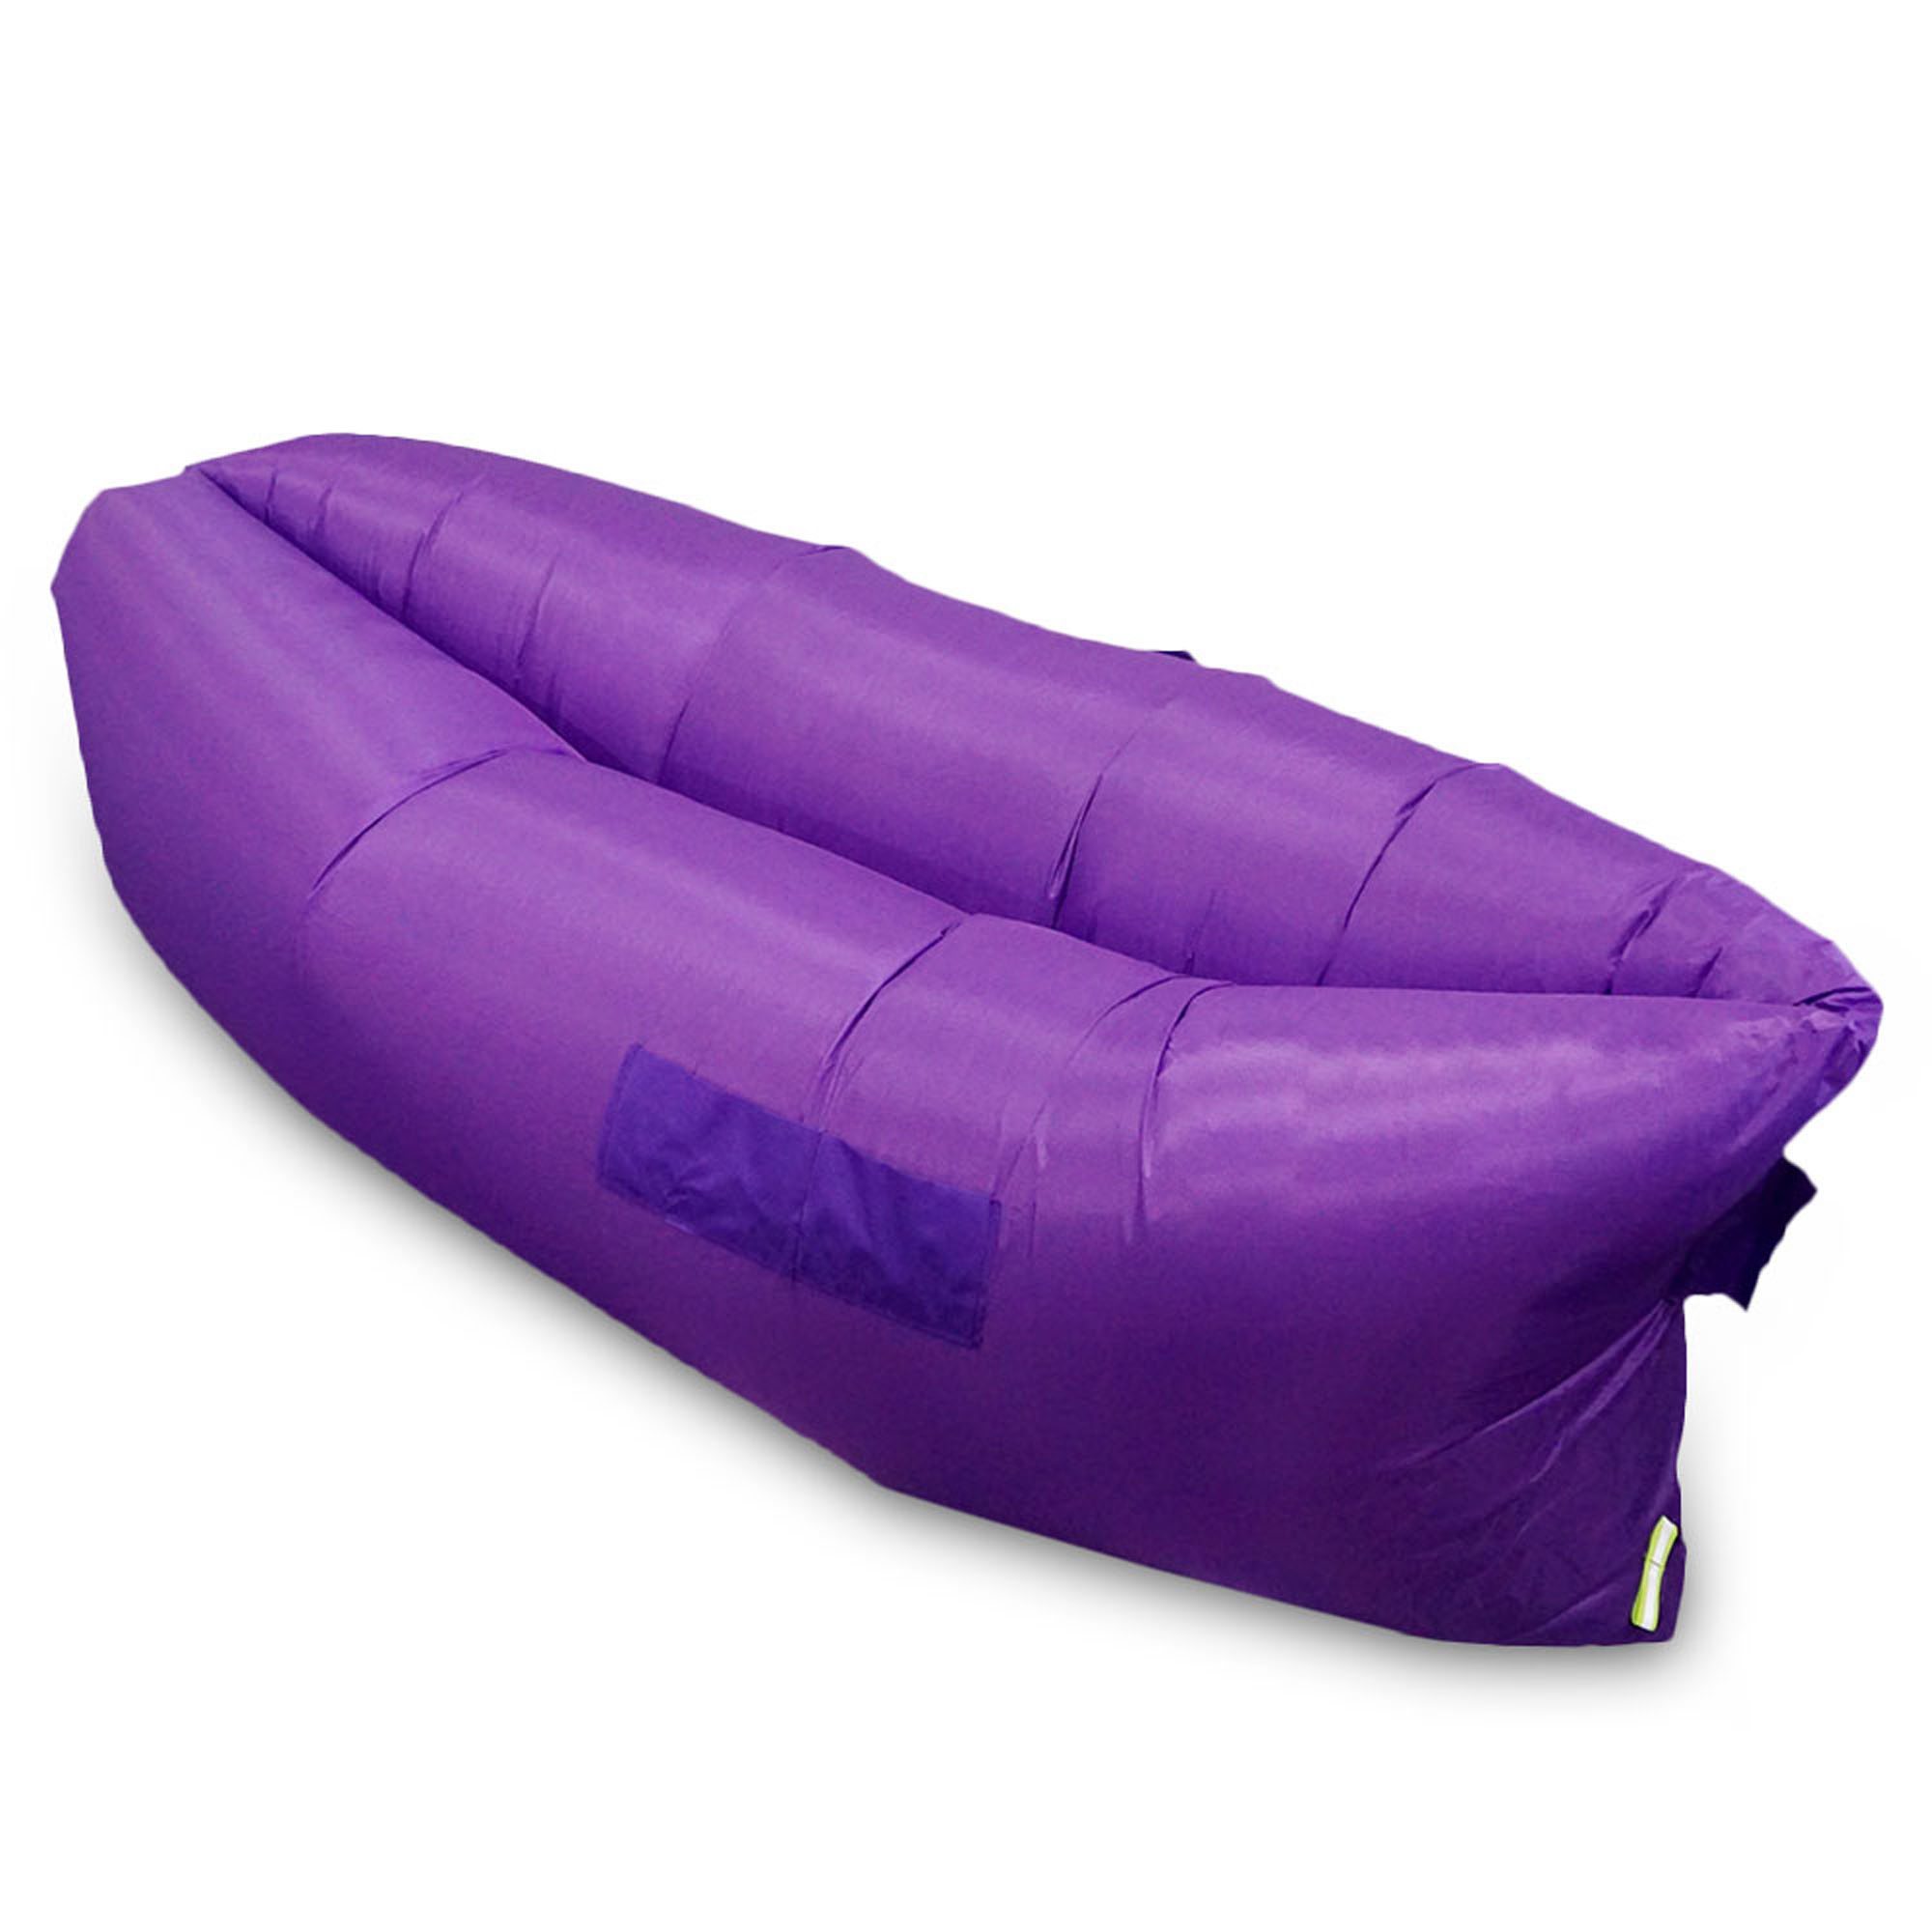 Odoland Folding Sleeping Bed Outdoor Camping Portable Air